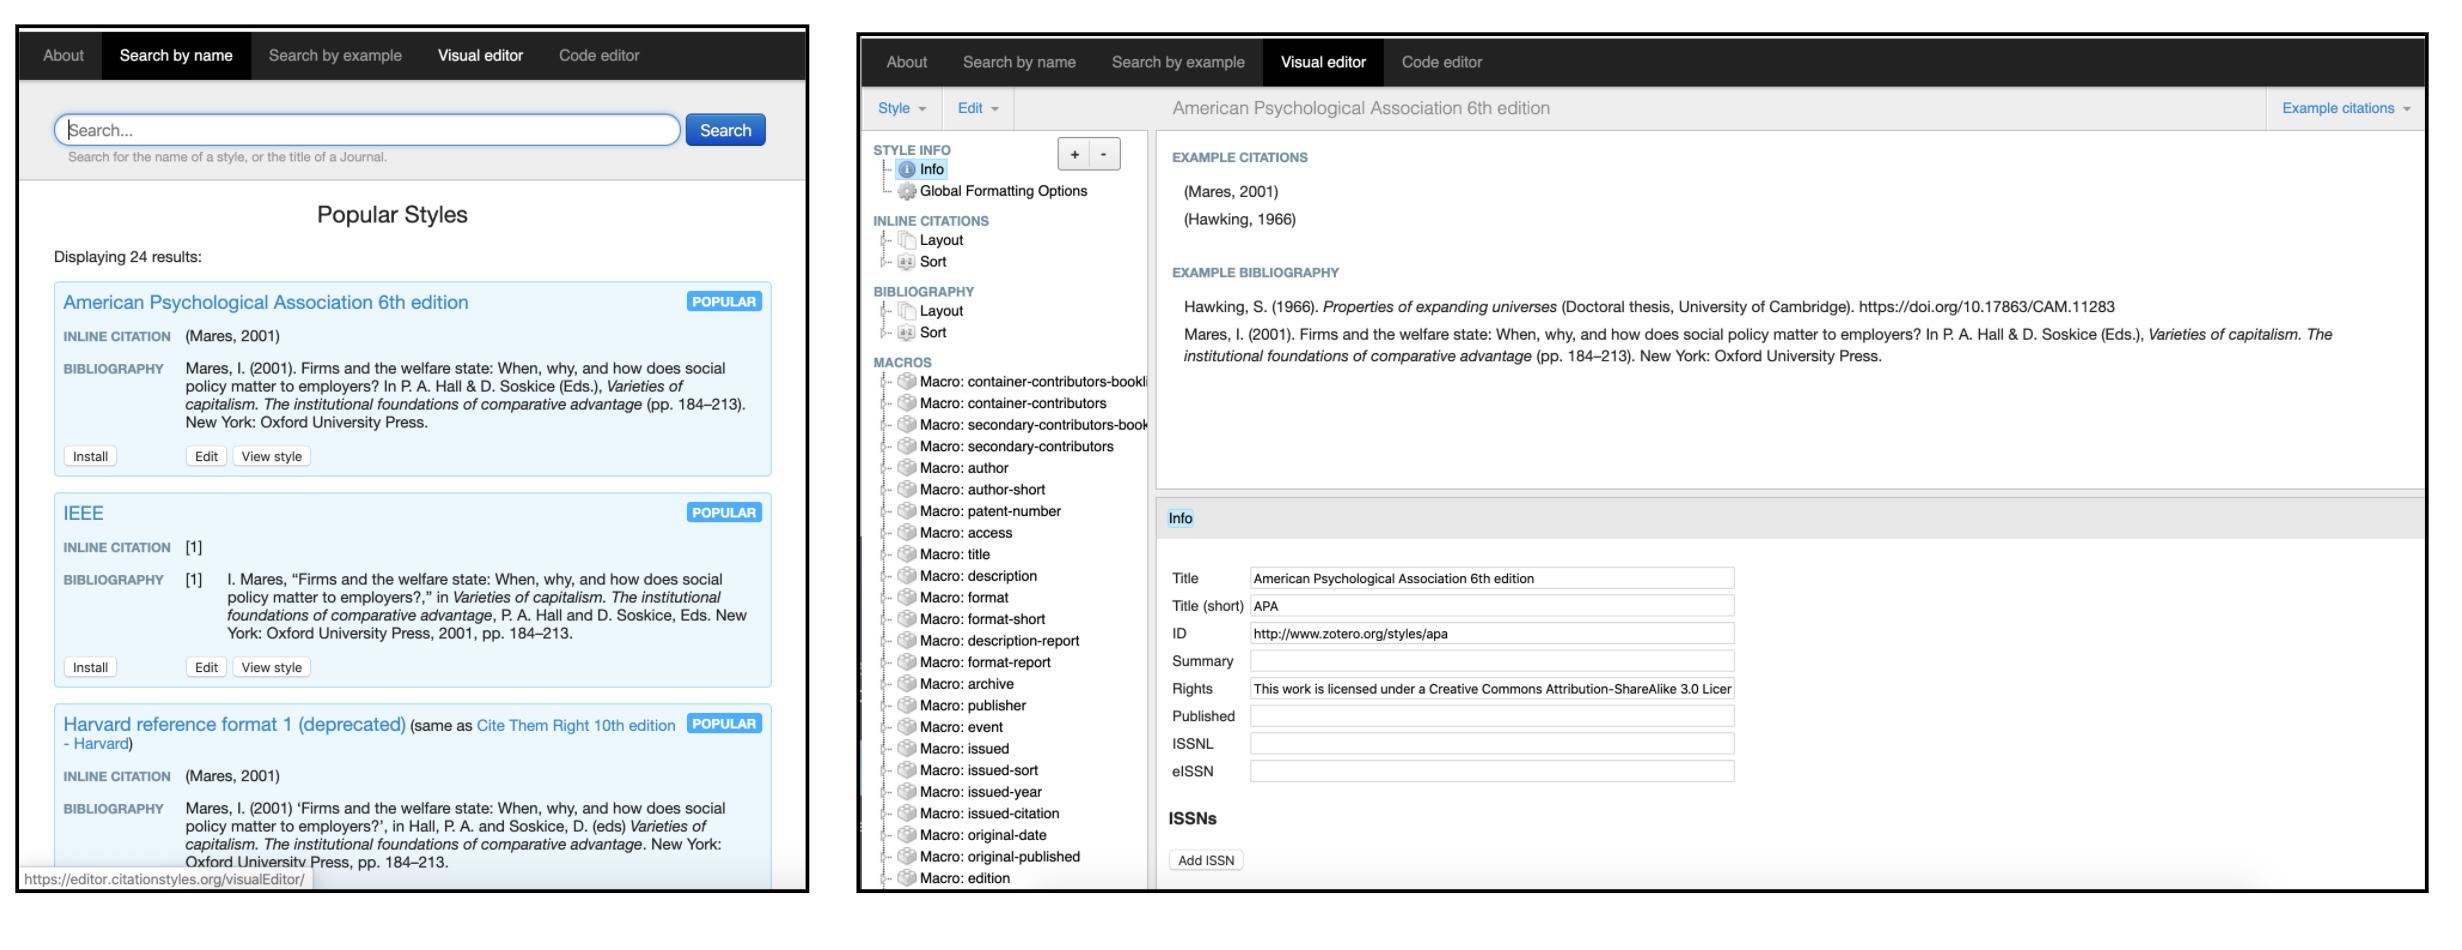 custom bibliography editor site for university